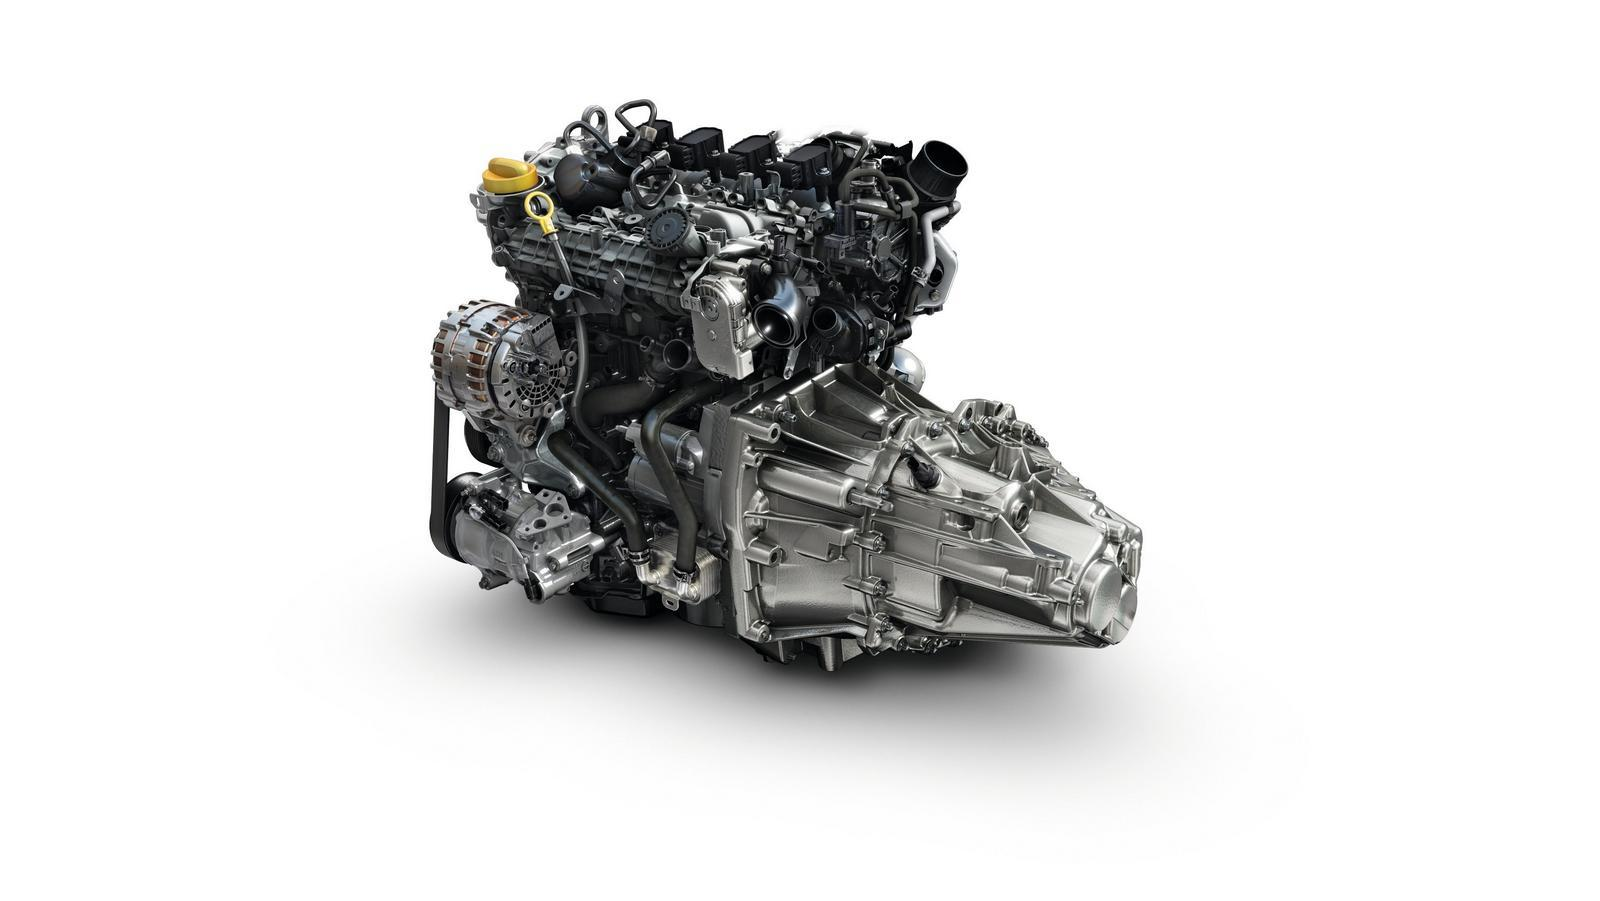 1.3 engine